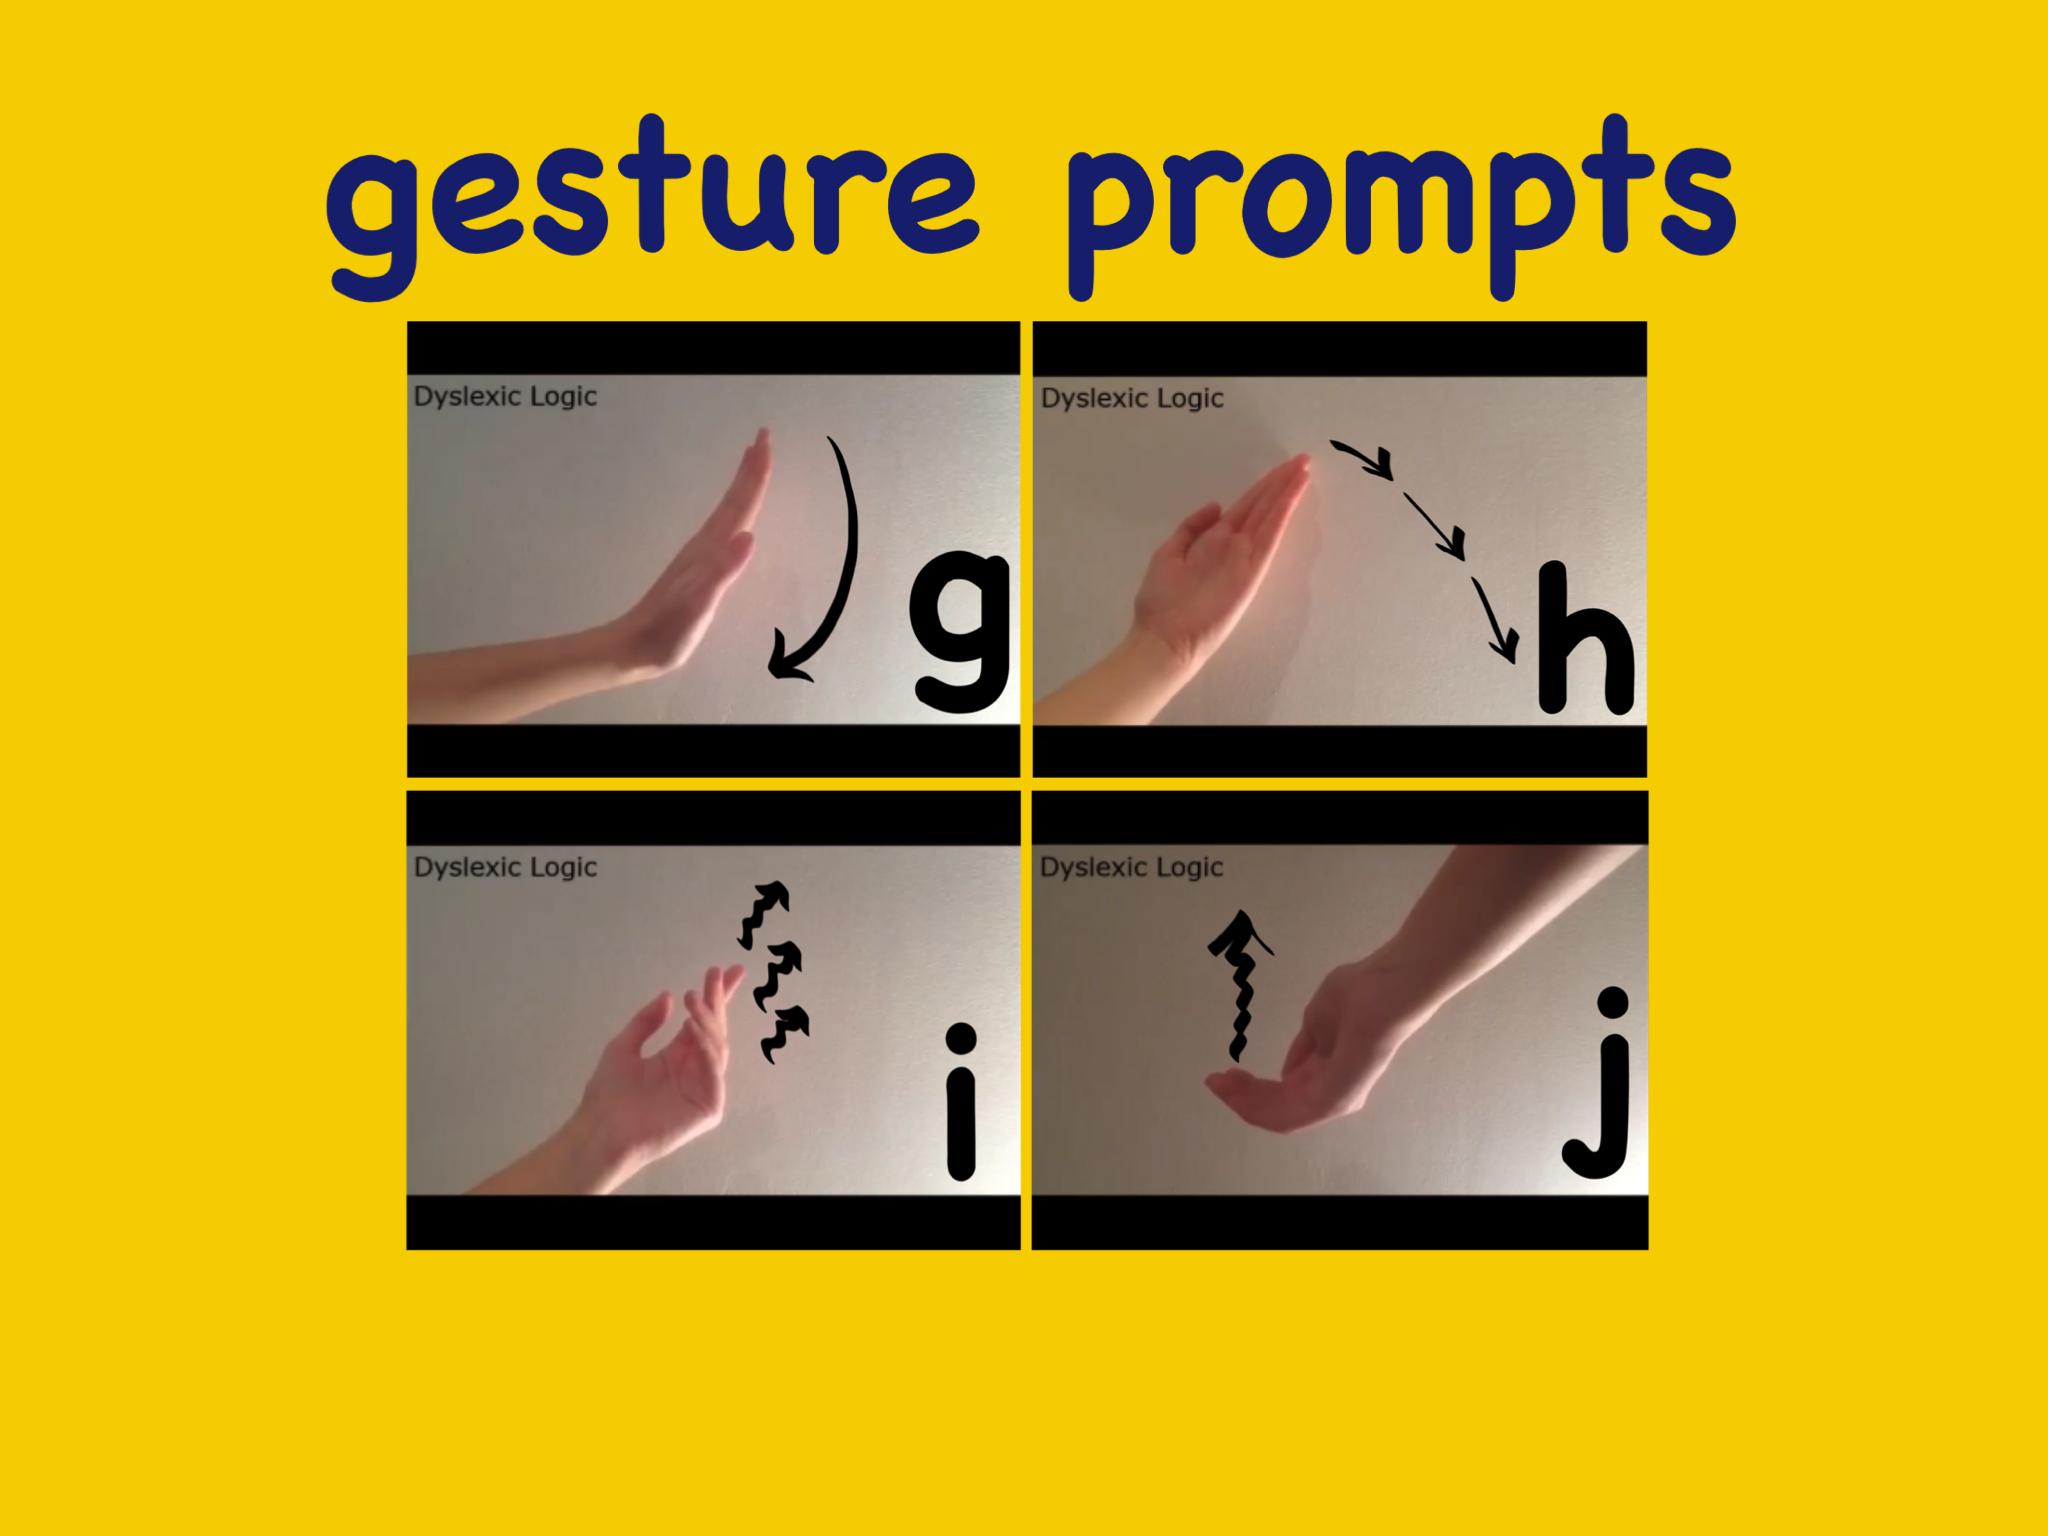 Described as 'makaton for phonics' gestures help distinguish between similar sounds.